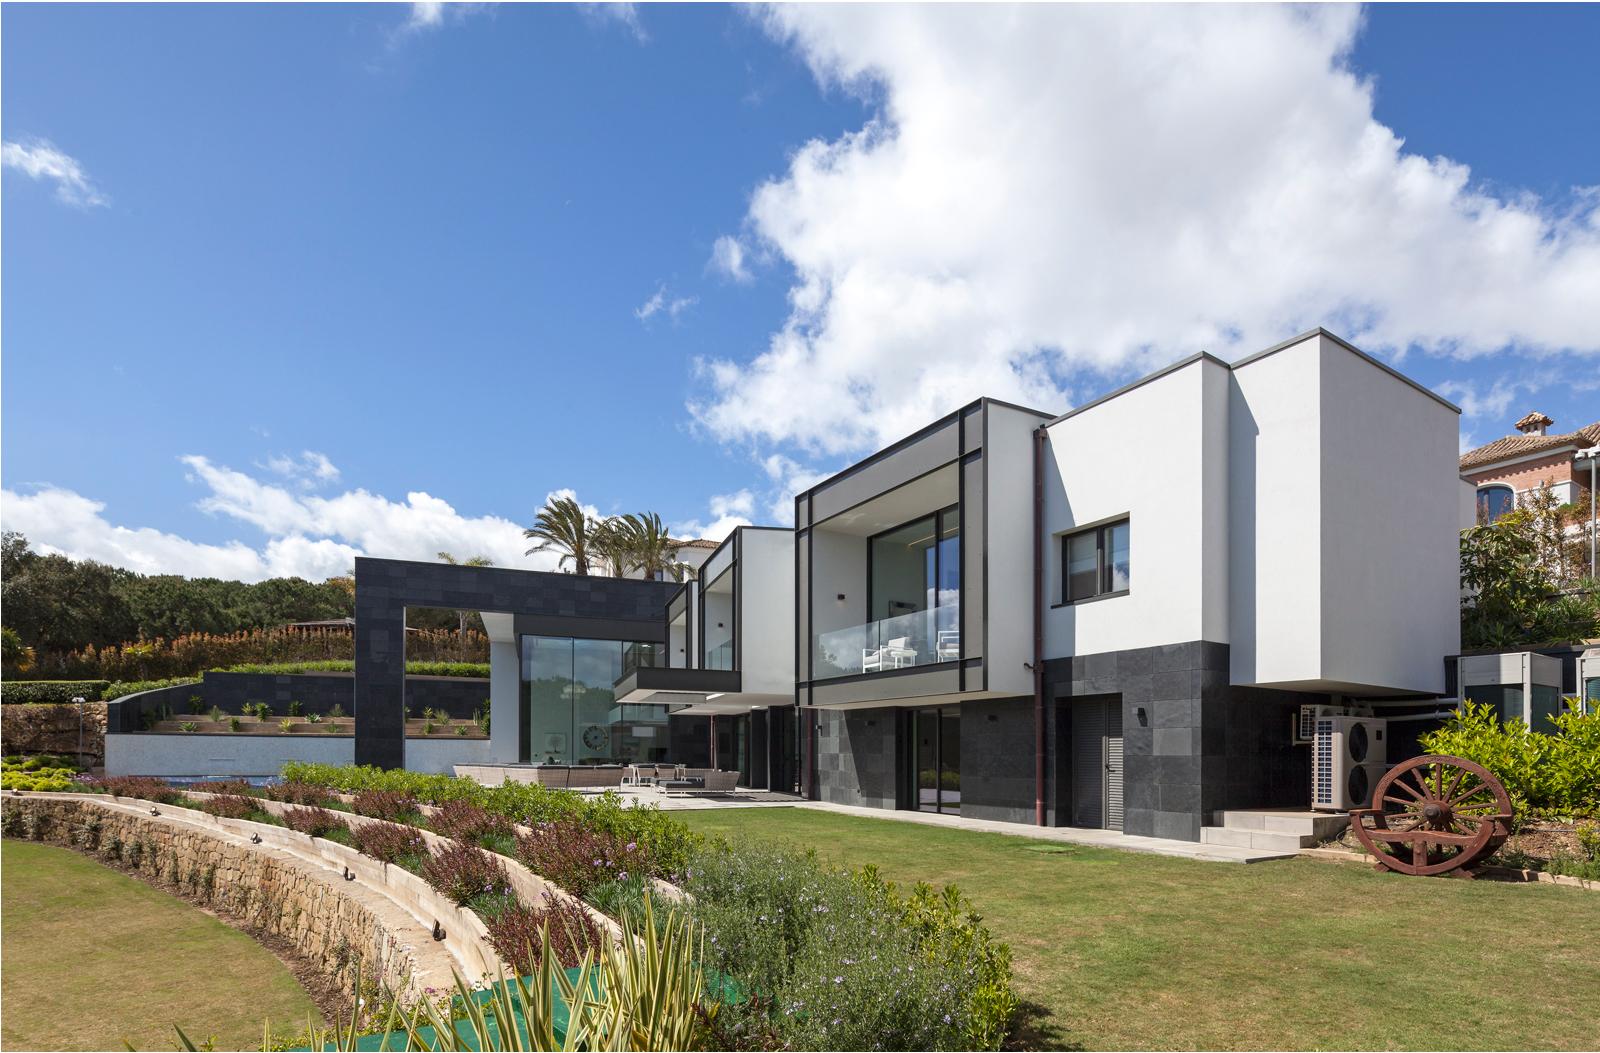 Villa-Kearney-Residential-Villa-Project-Architect-Spain-2